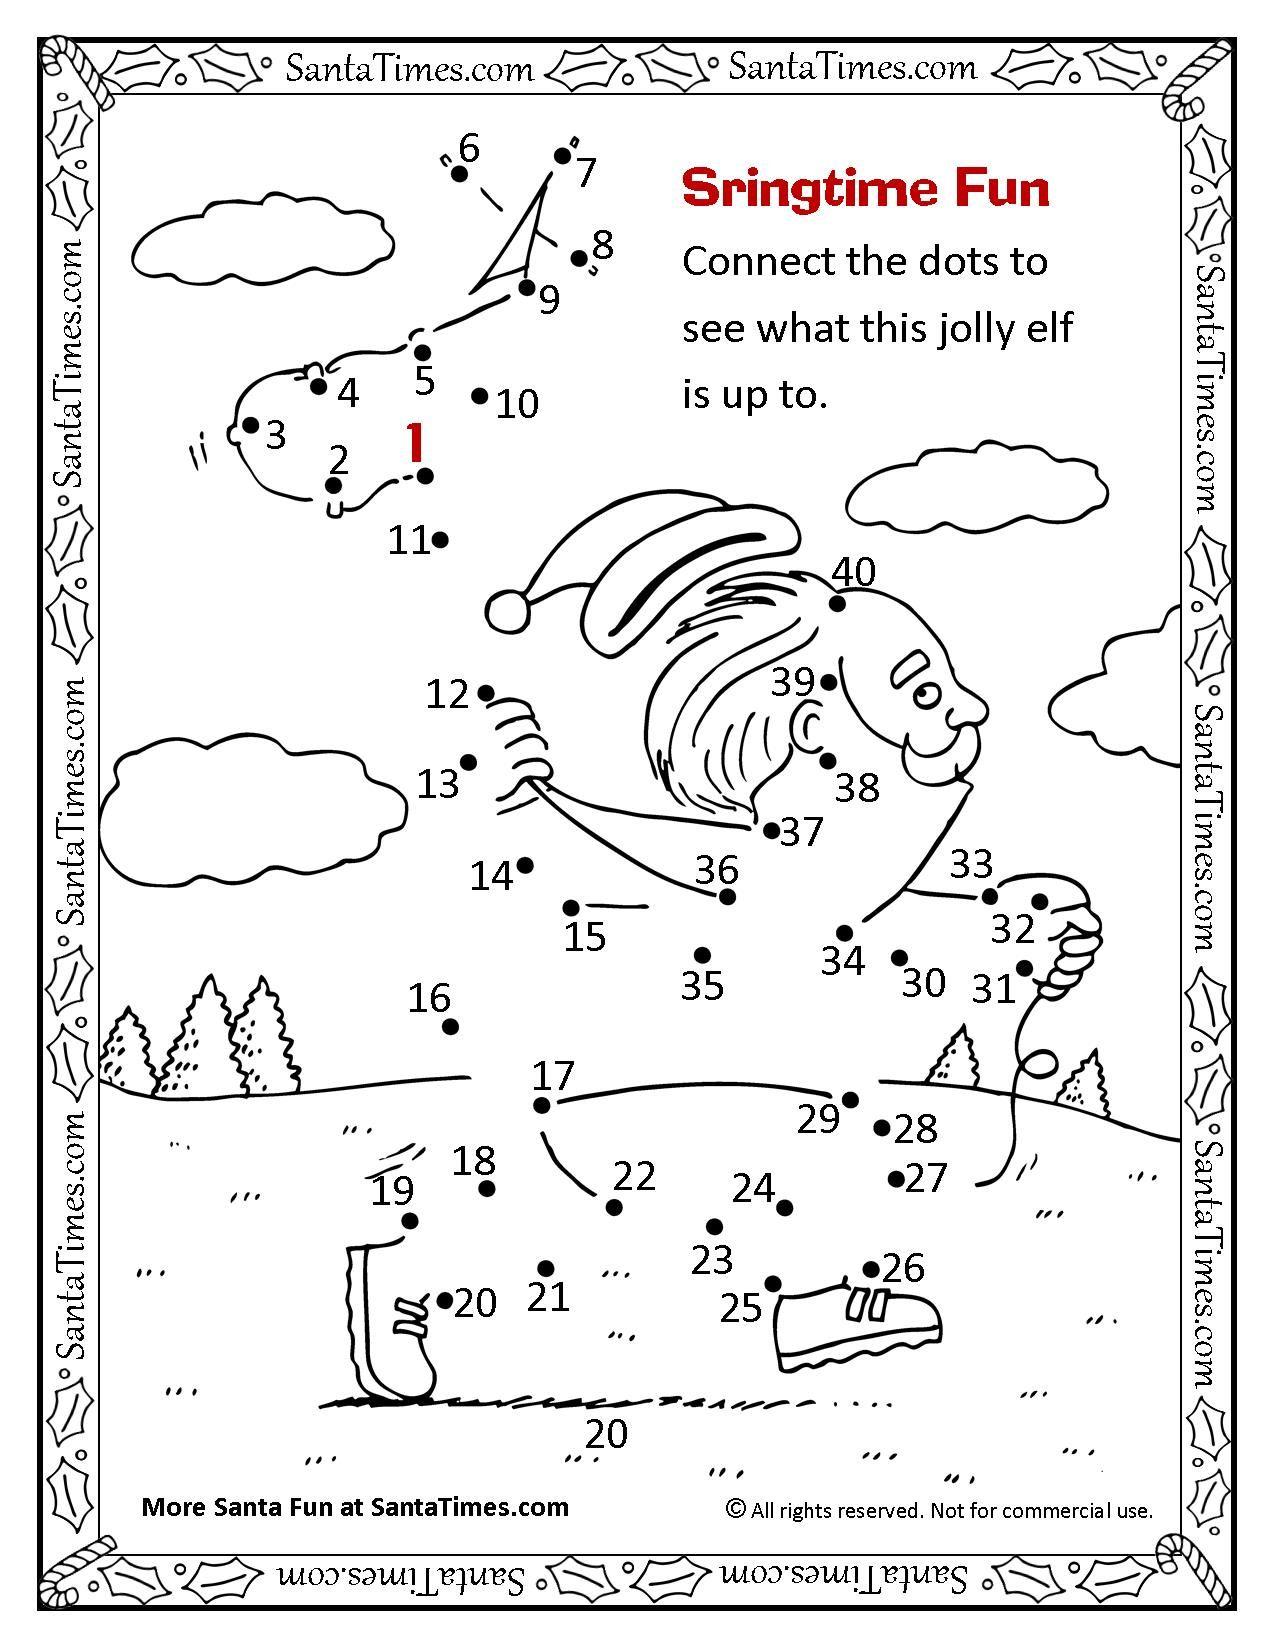 photo regarding Fun Printable Activities called Springtime Santa Pleasurable Dot-towards-dot Pleasurable Printable Coloring